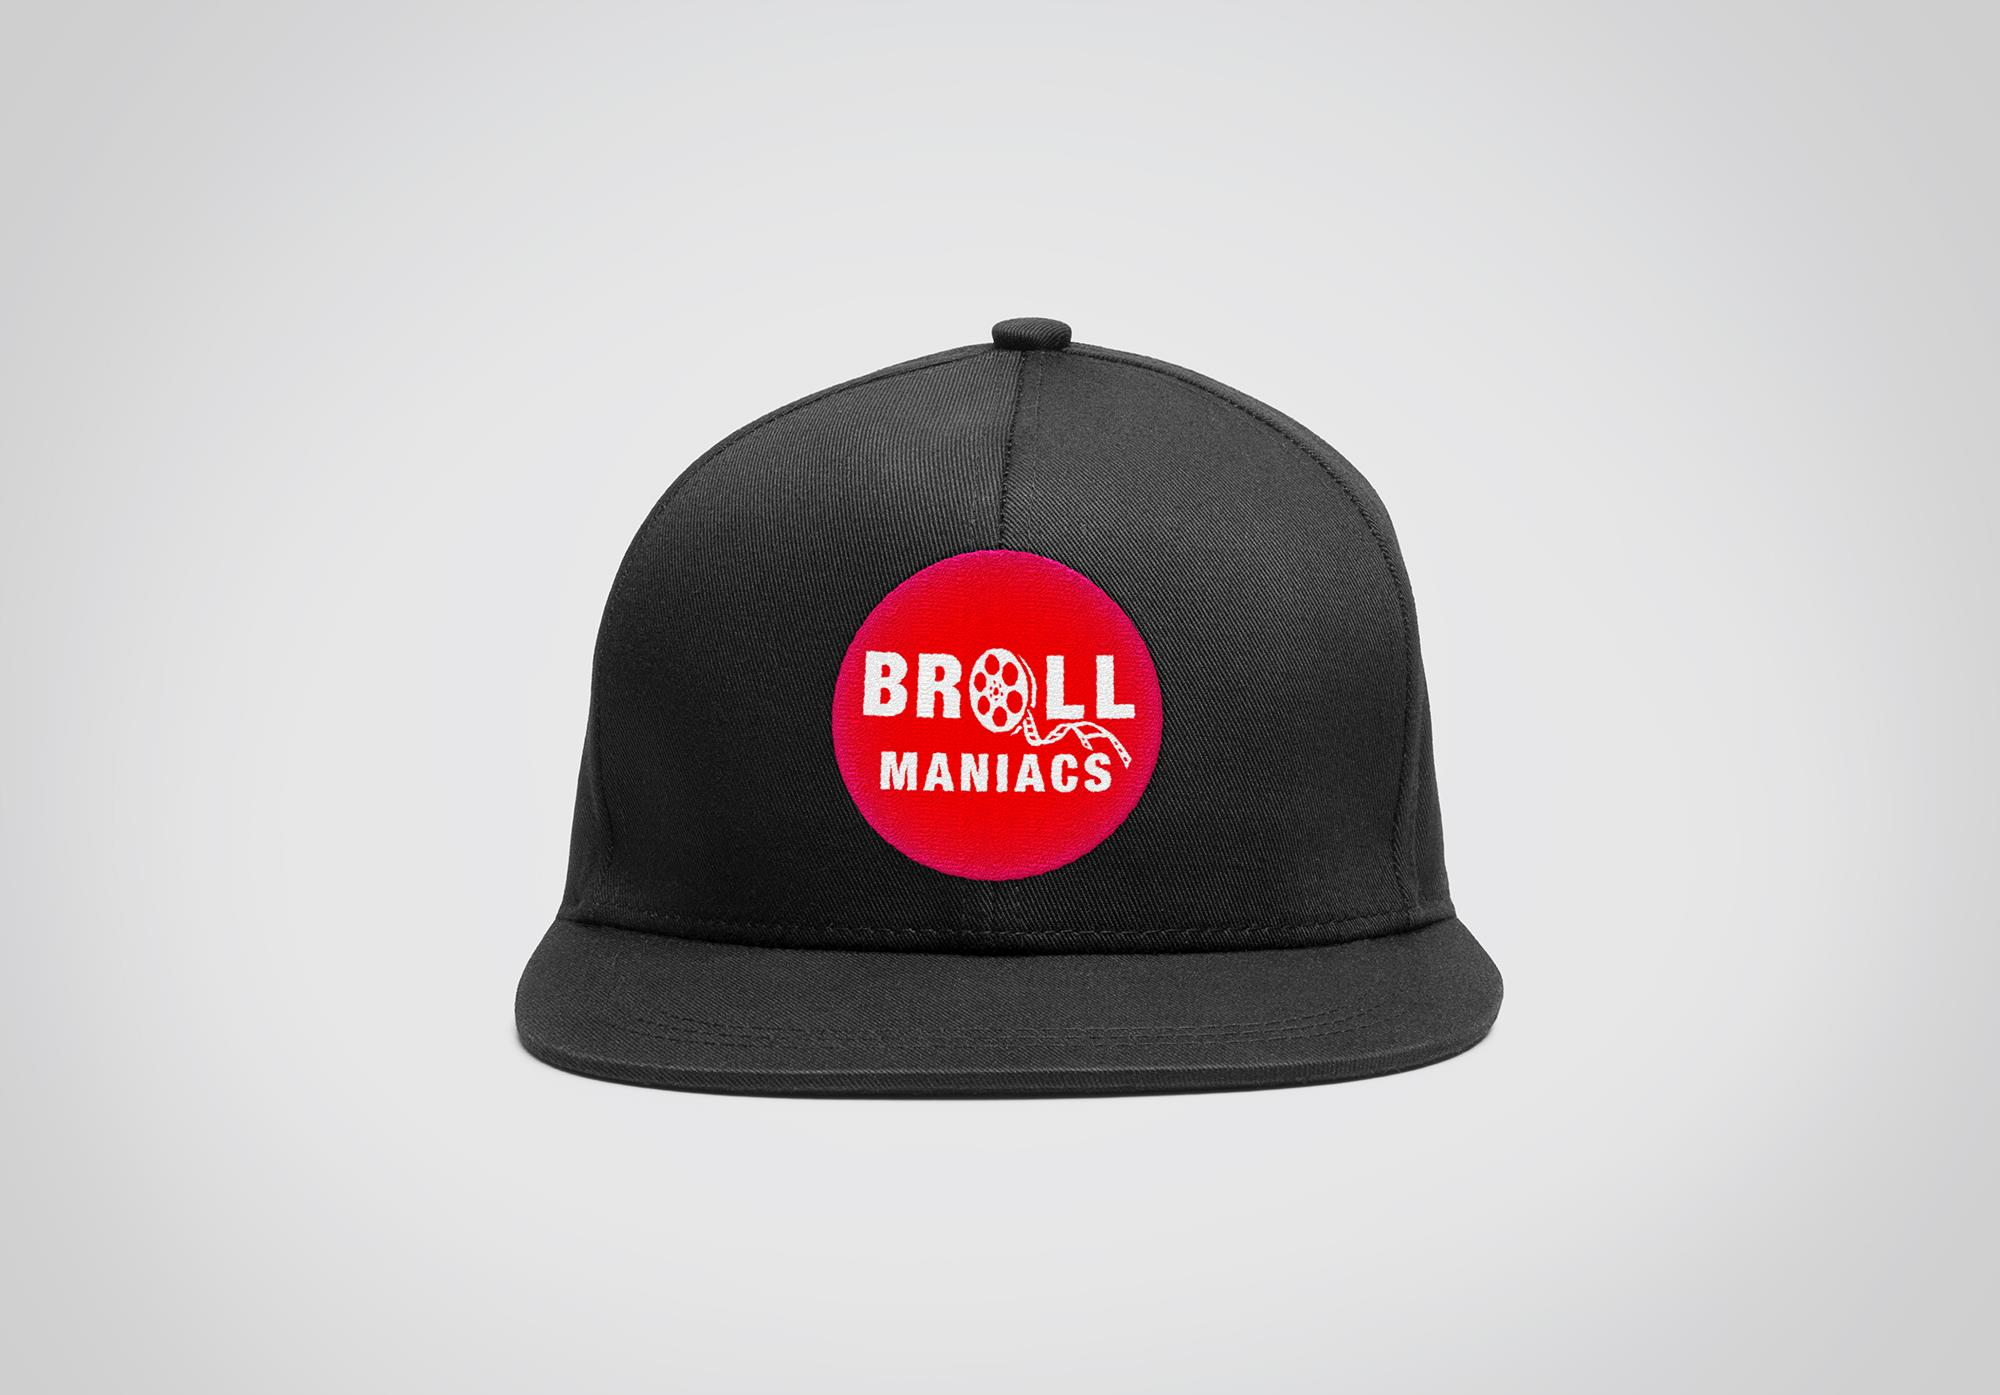 -broll-maniacs-logo-snapback-cap32000x1395